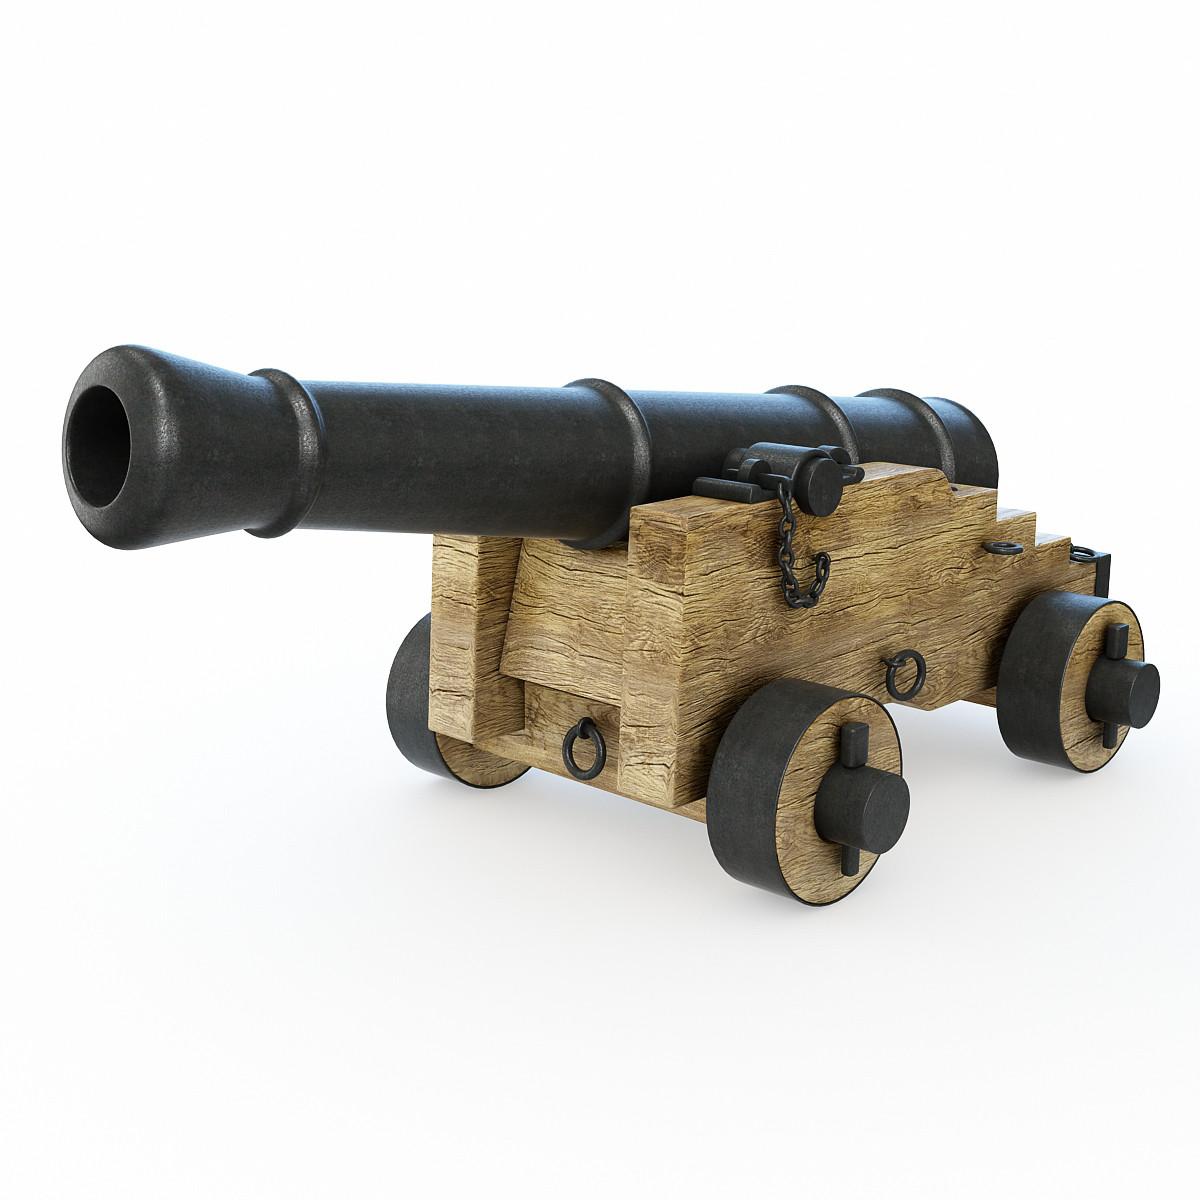 cannon artillery naval 3d model